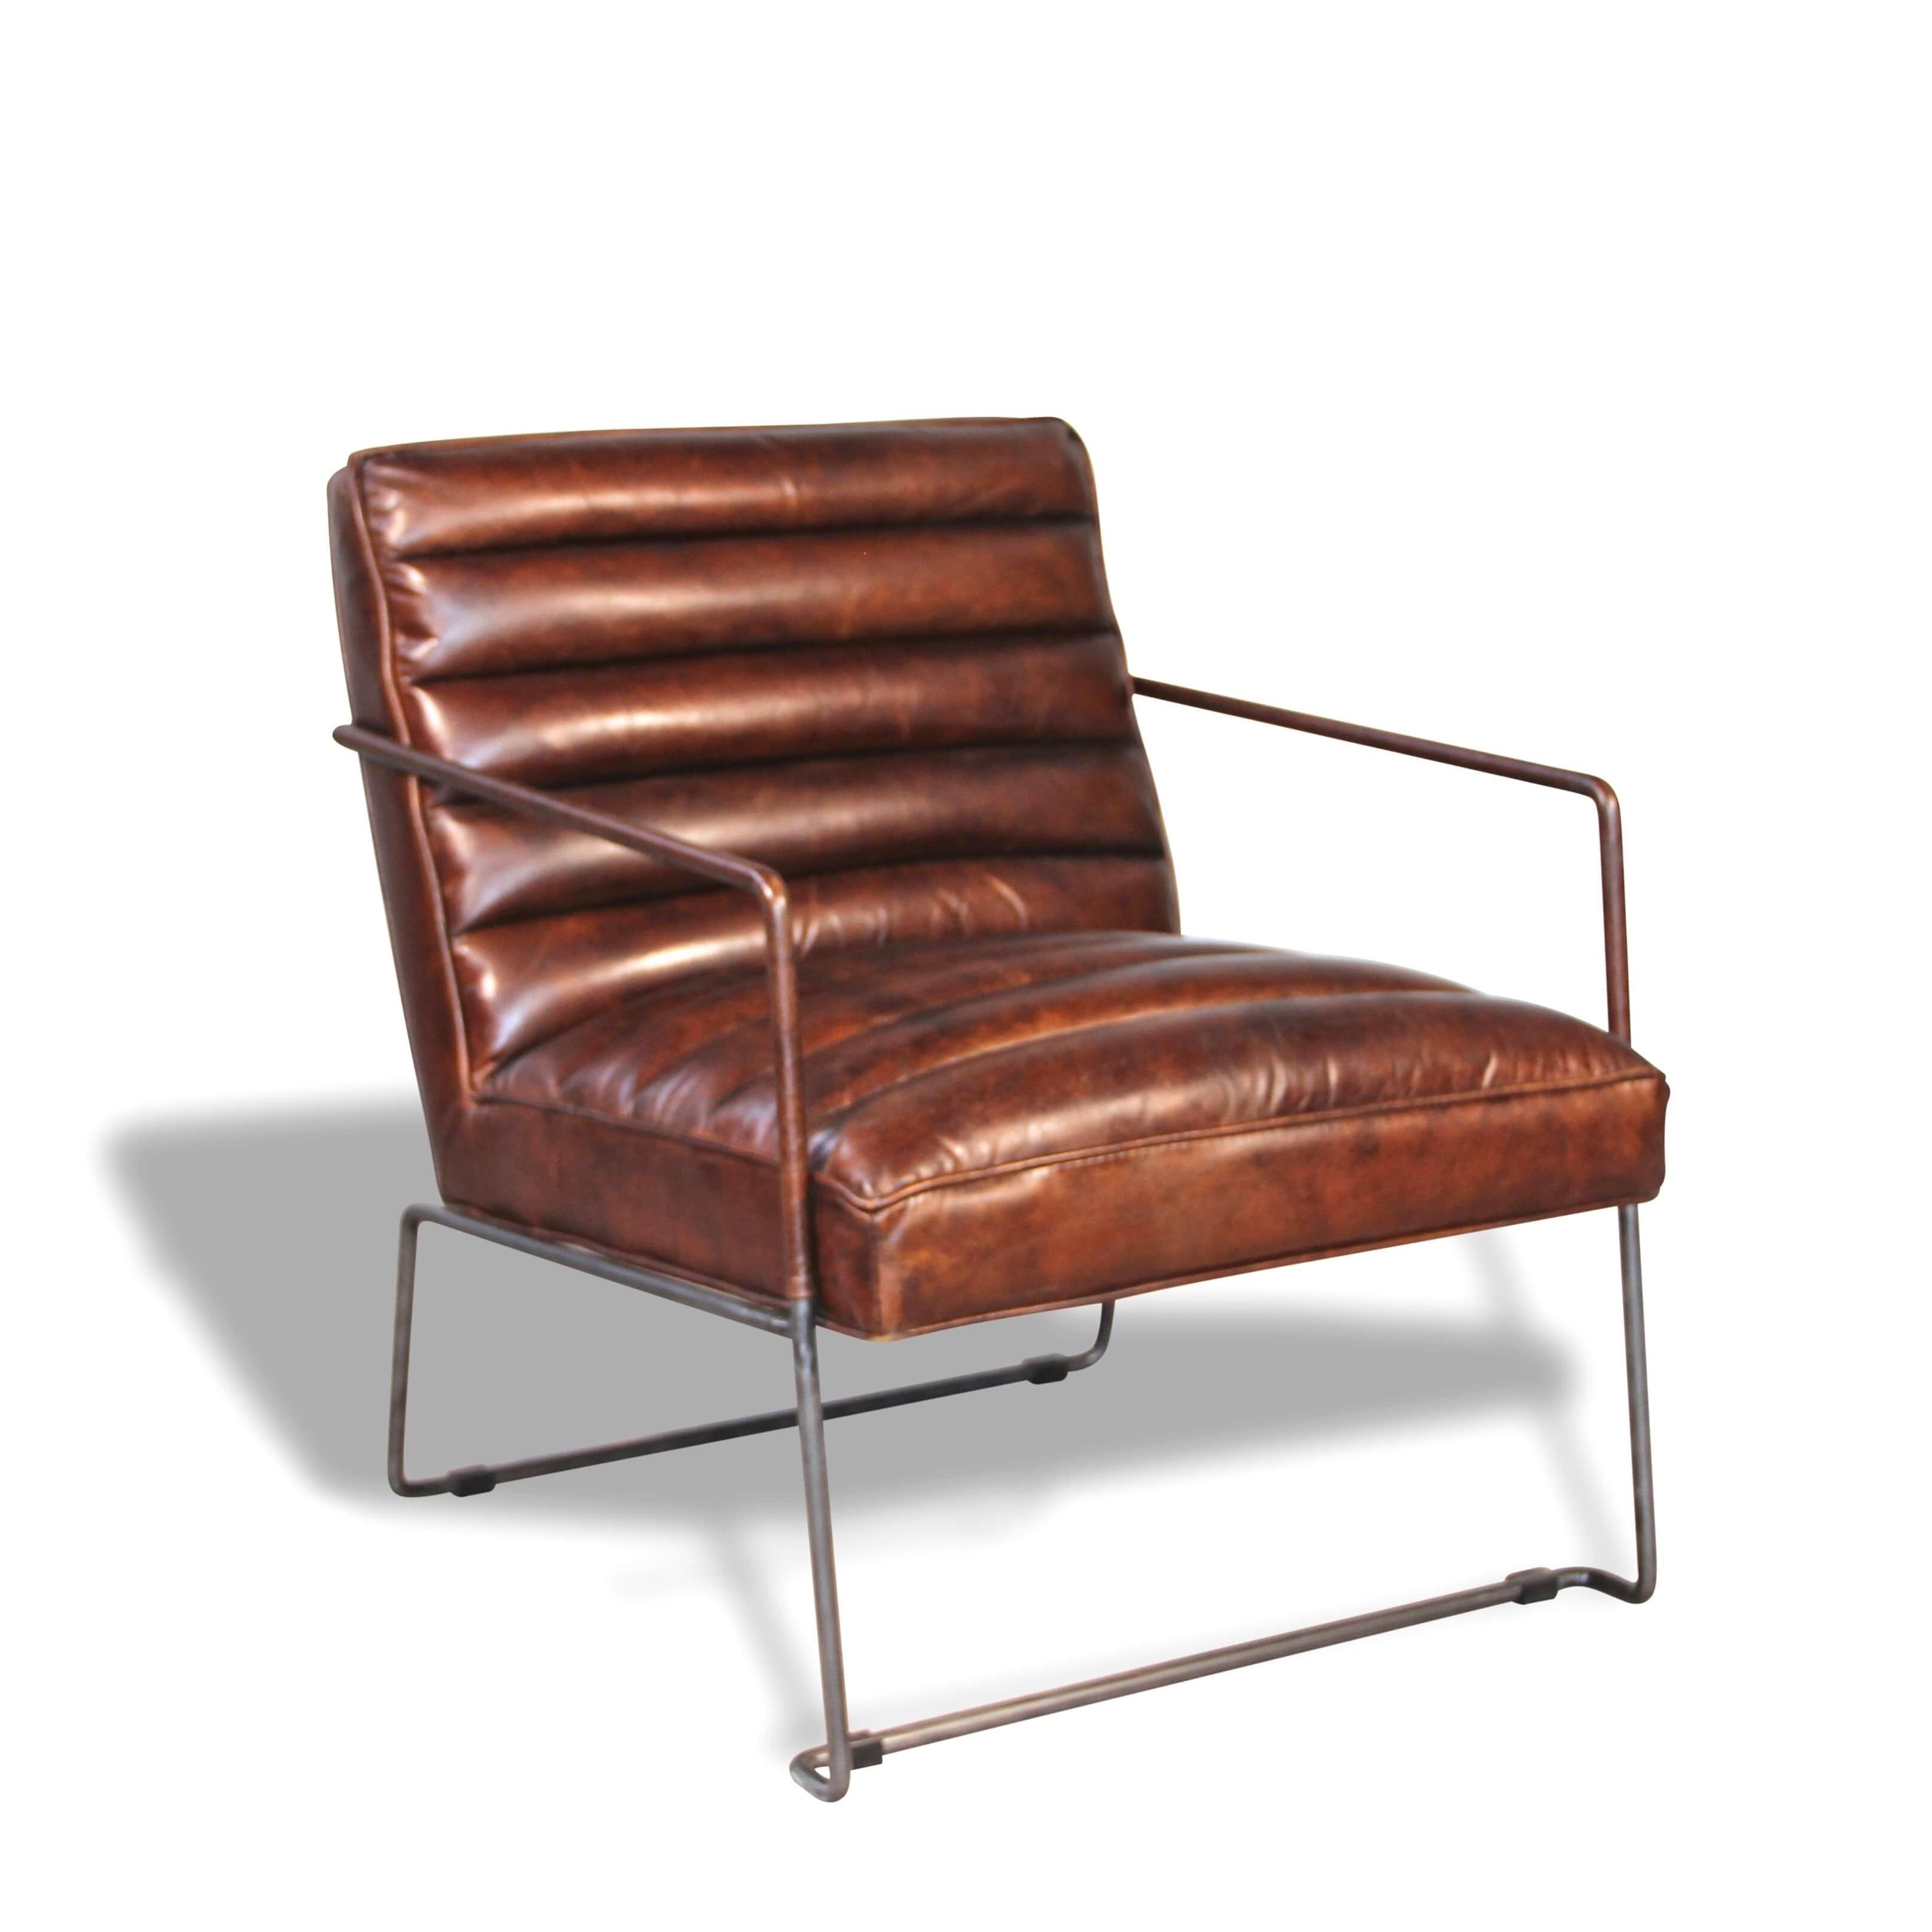 Sessel In Patina vintage Braun Leder und Metall